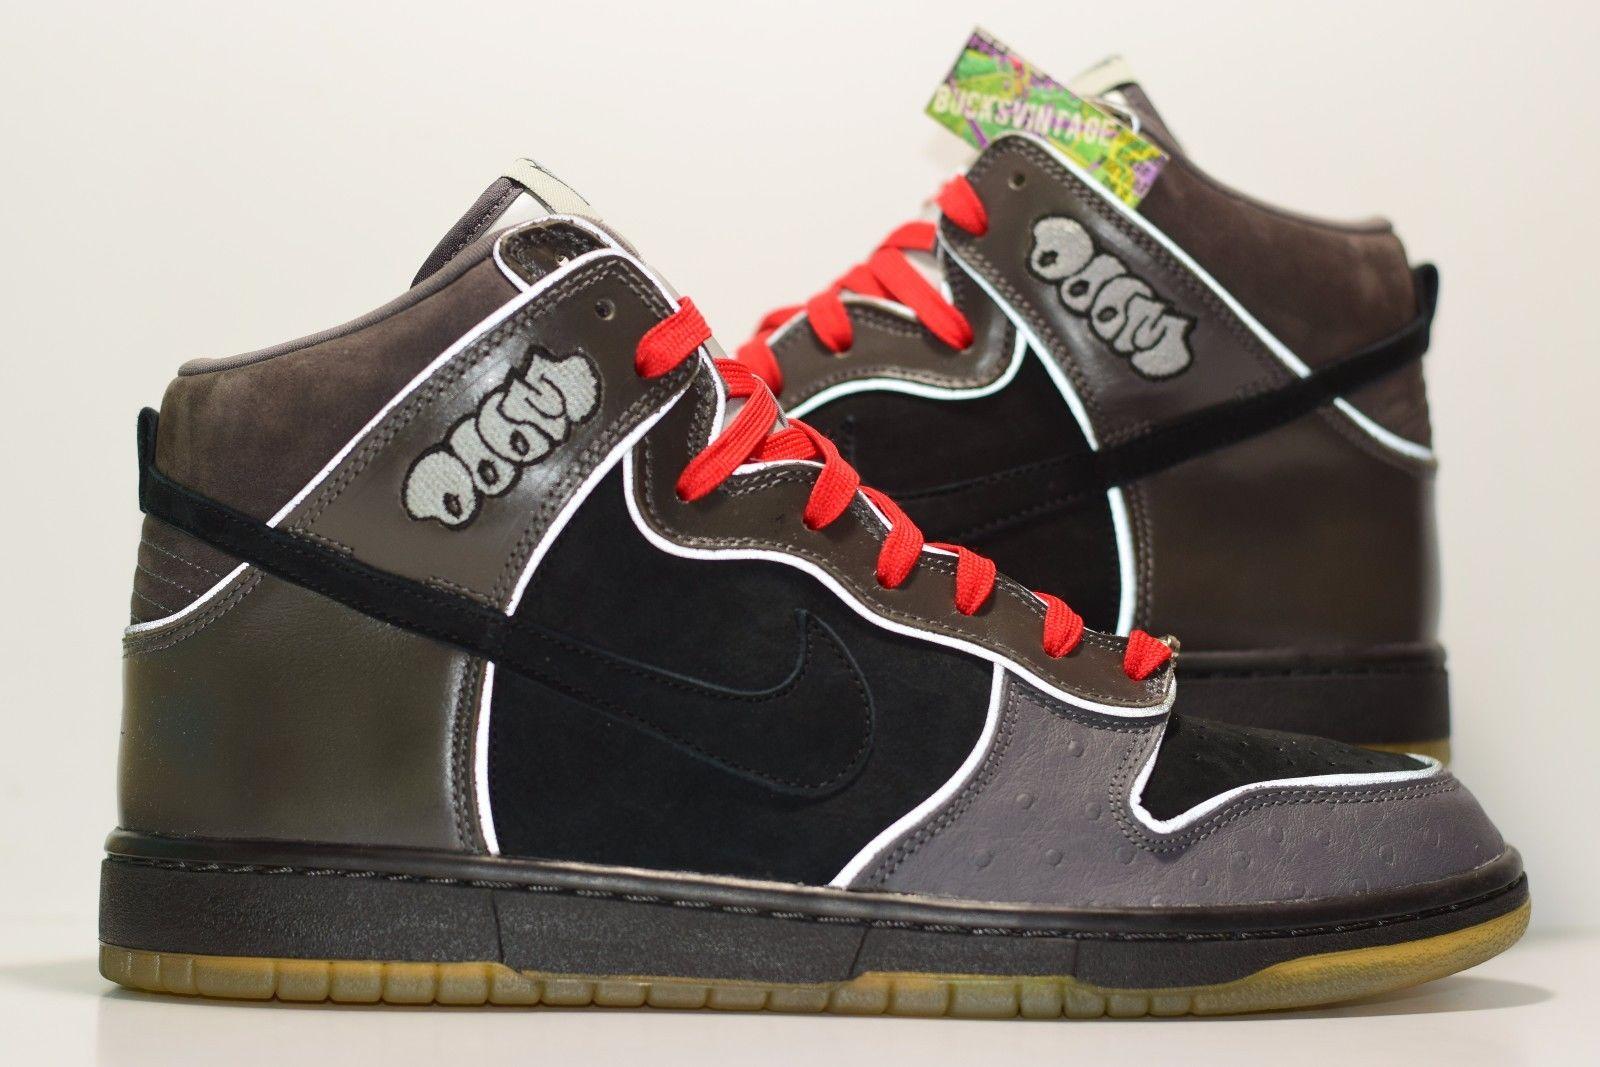 quality design 256a9 ab6d8 Size 11 | DS 2007 Nike Dunk High Pro SB MF Doom #313171-004  Black/Black/Midnight Fog from BucksVintage